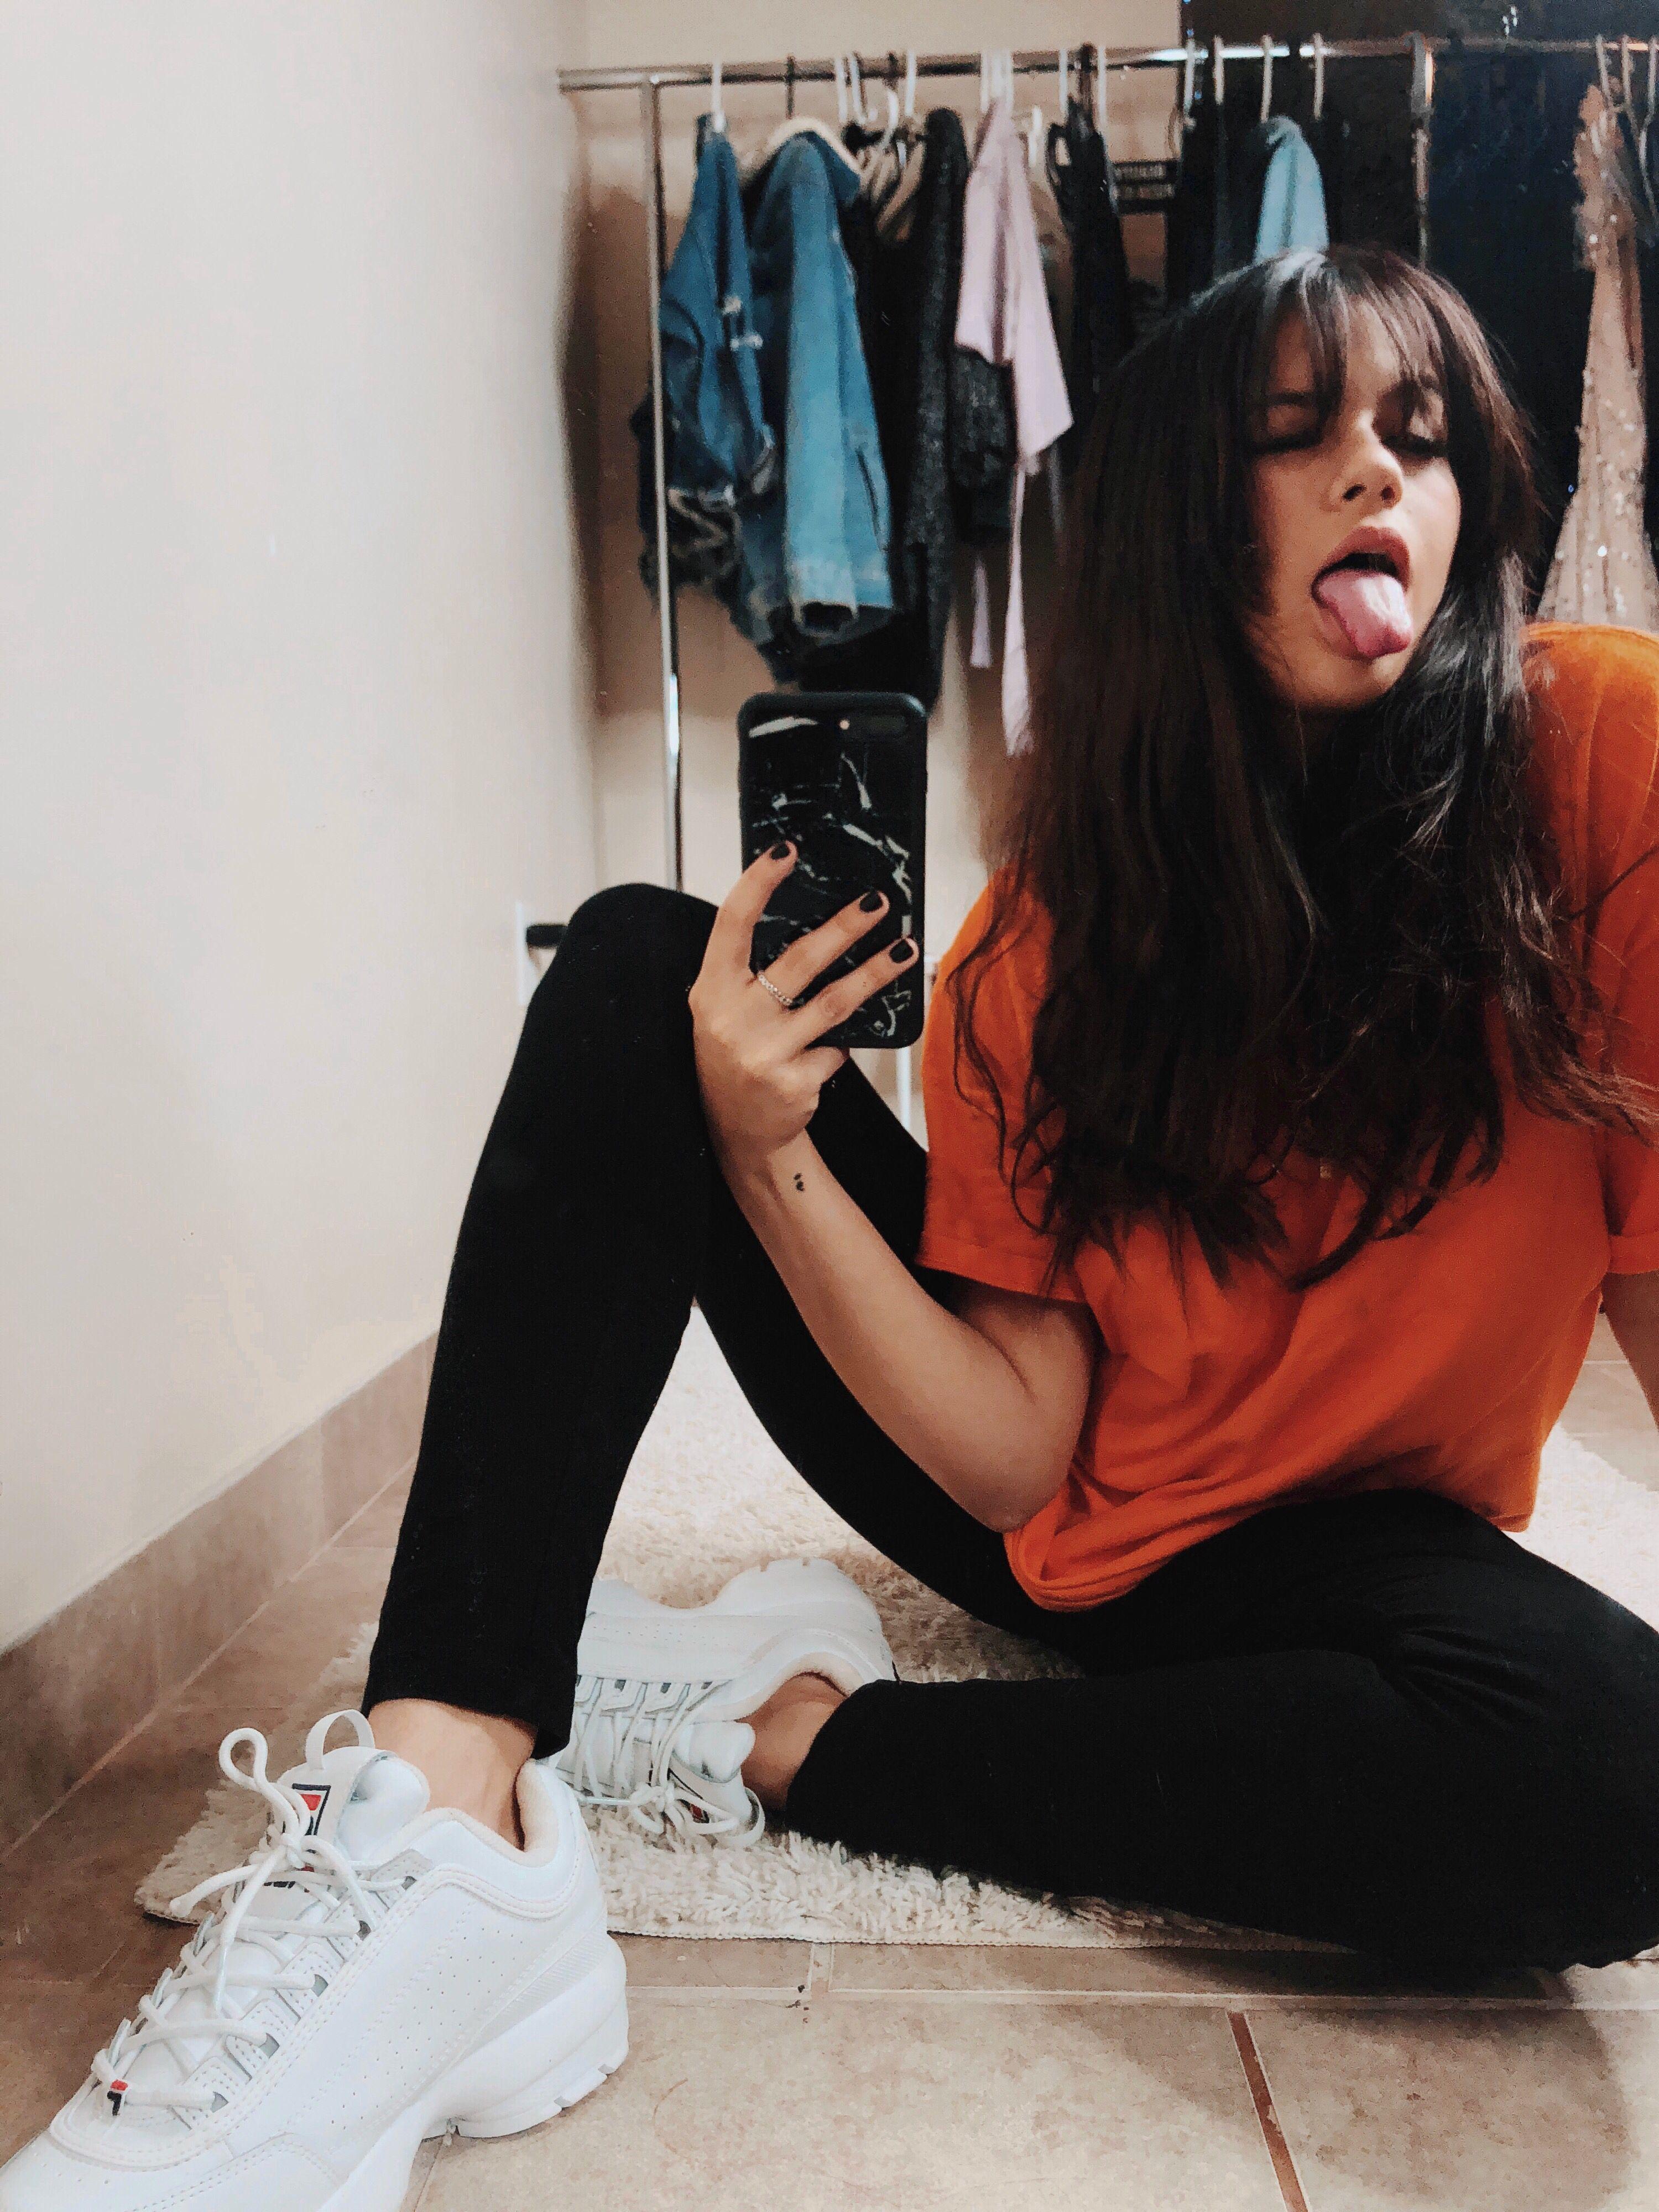 Fila White Sneakers + Casual Outfit | Fila in 2019 | Fila